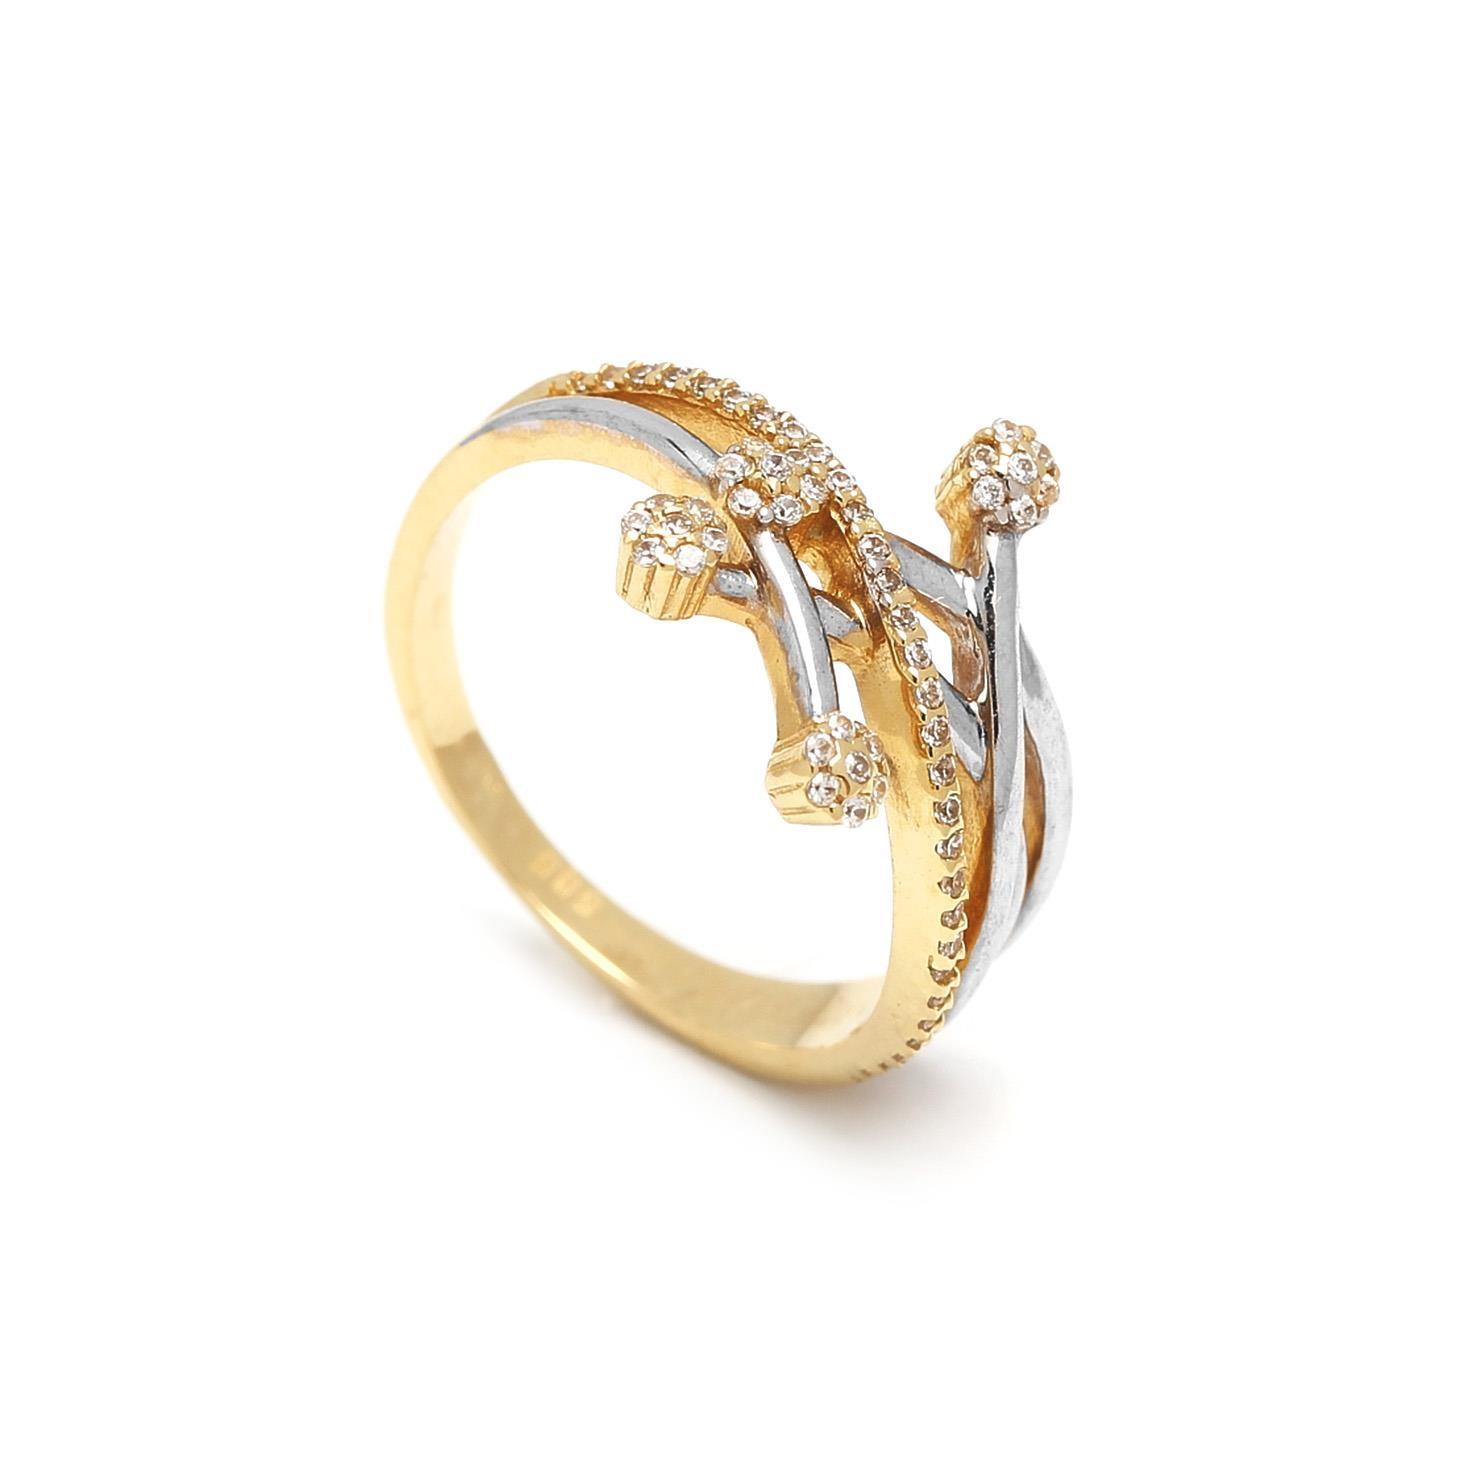 1156a8675 Zlatý dámsky prsteň DEBORA